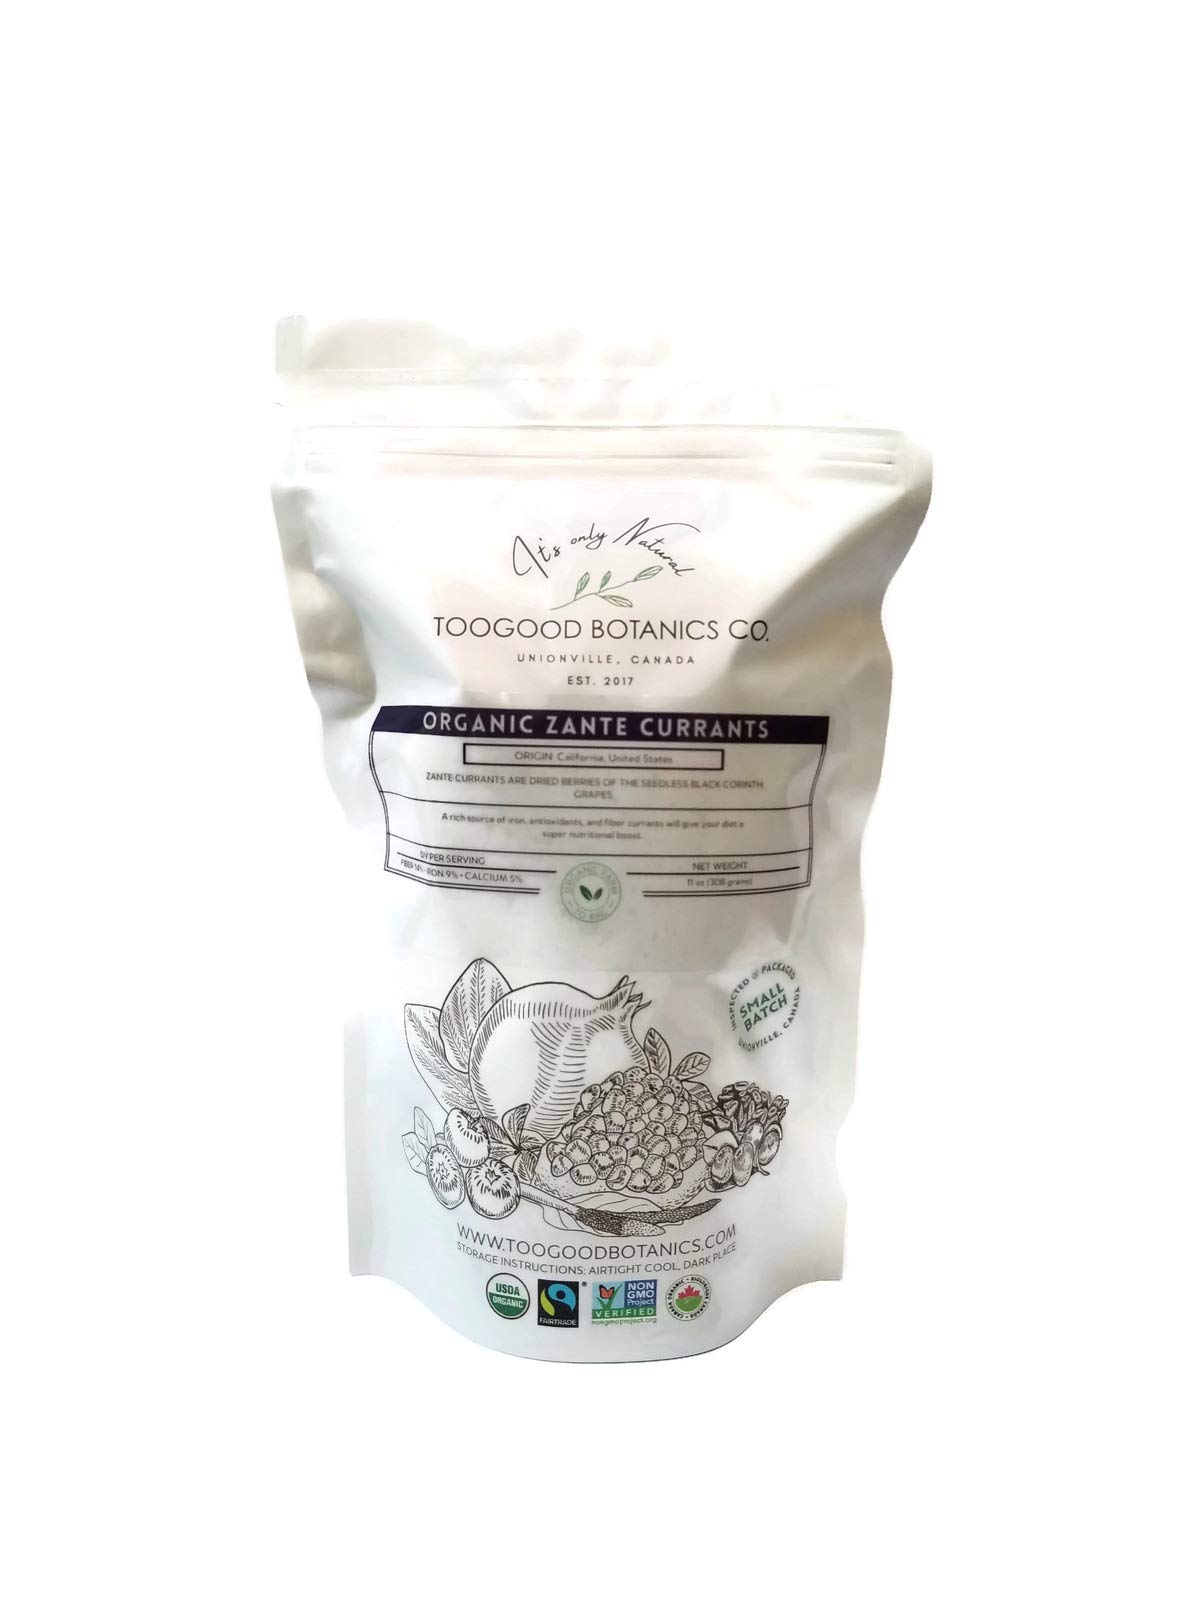 Organic Zante Currants, Seedless Raisins (11 ounces, 308 grams)